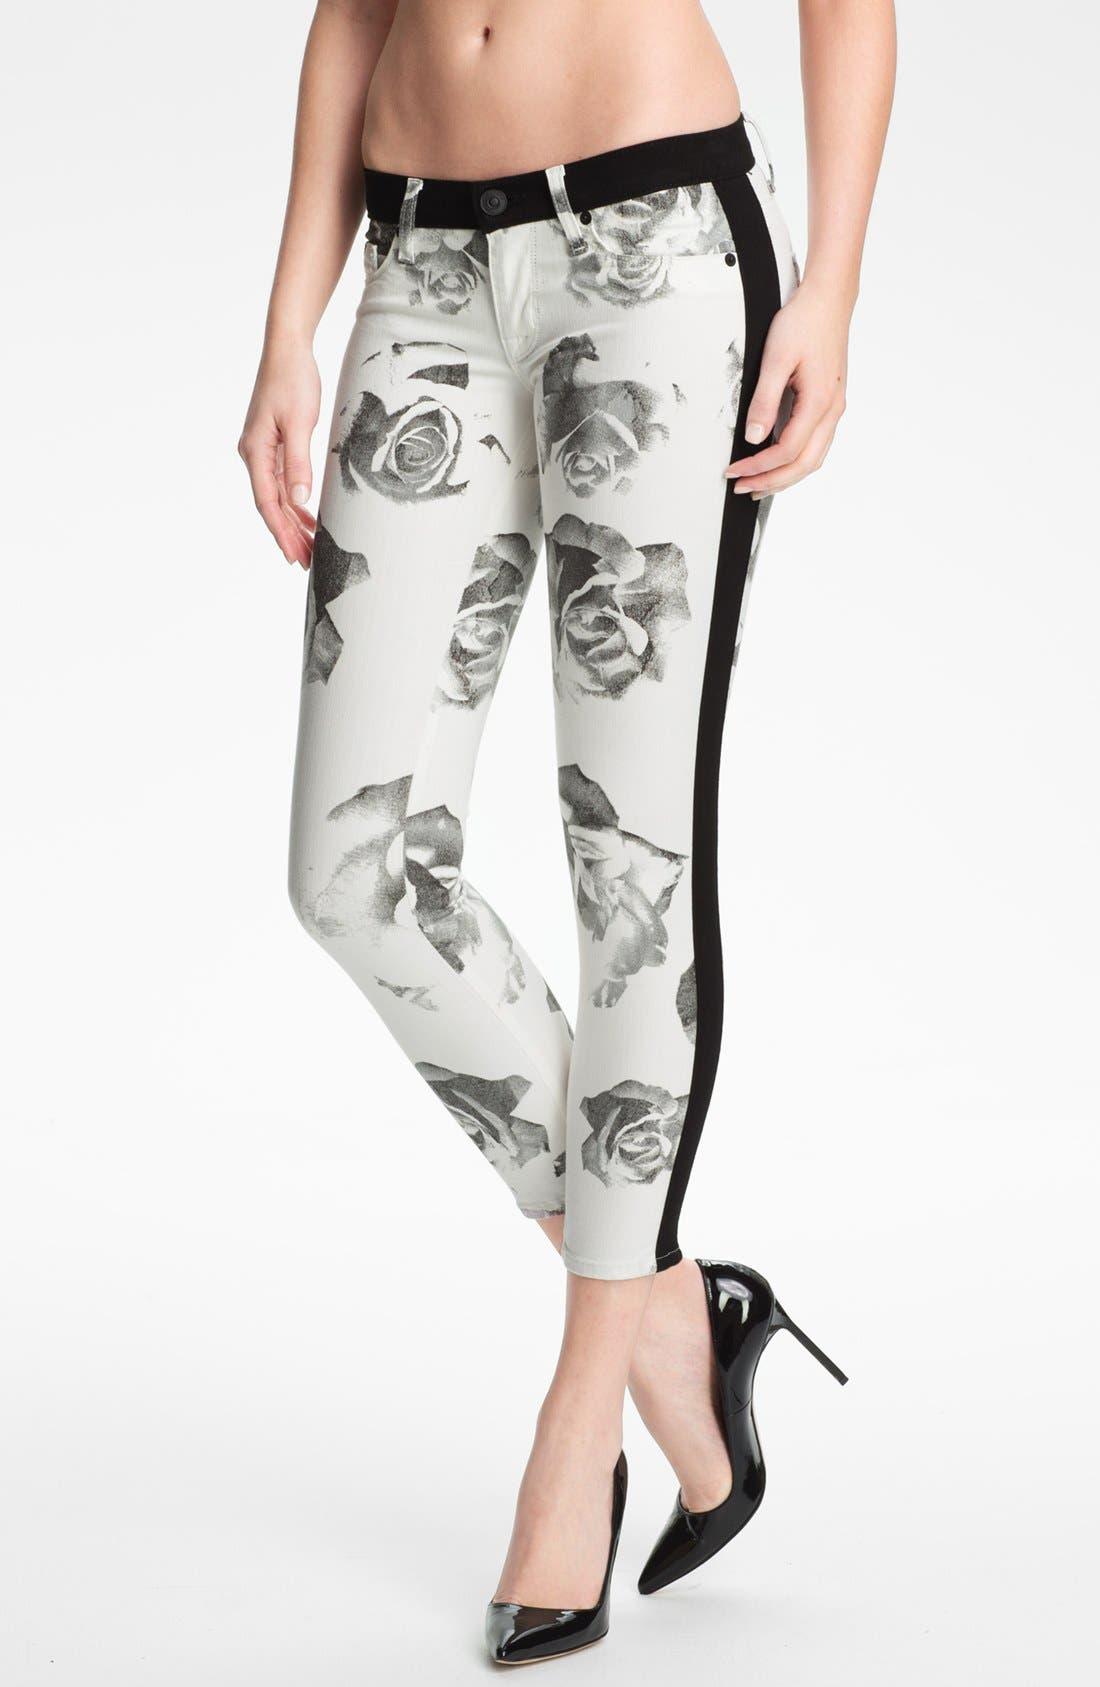 Alternate Image 1 Selected - Hudson Jeans 'Leeloo' Colorblock Crop Skinny Jeans (Black/White Floral)